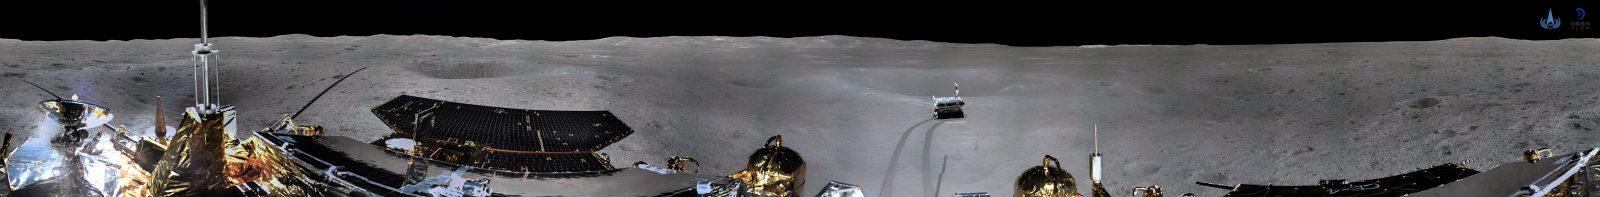 Панорамный снимок Луны